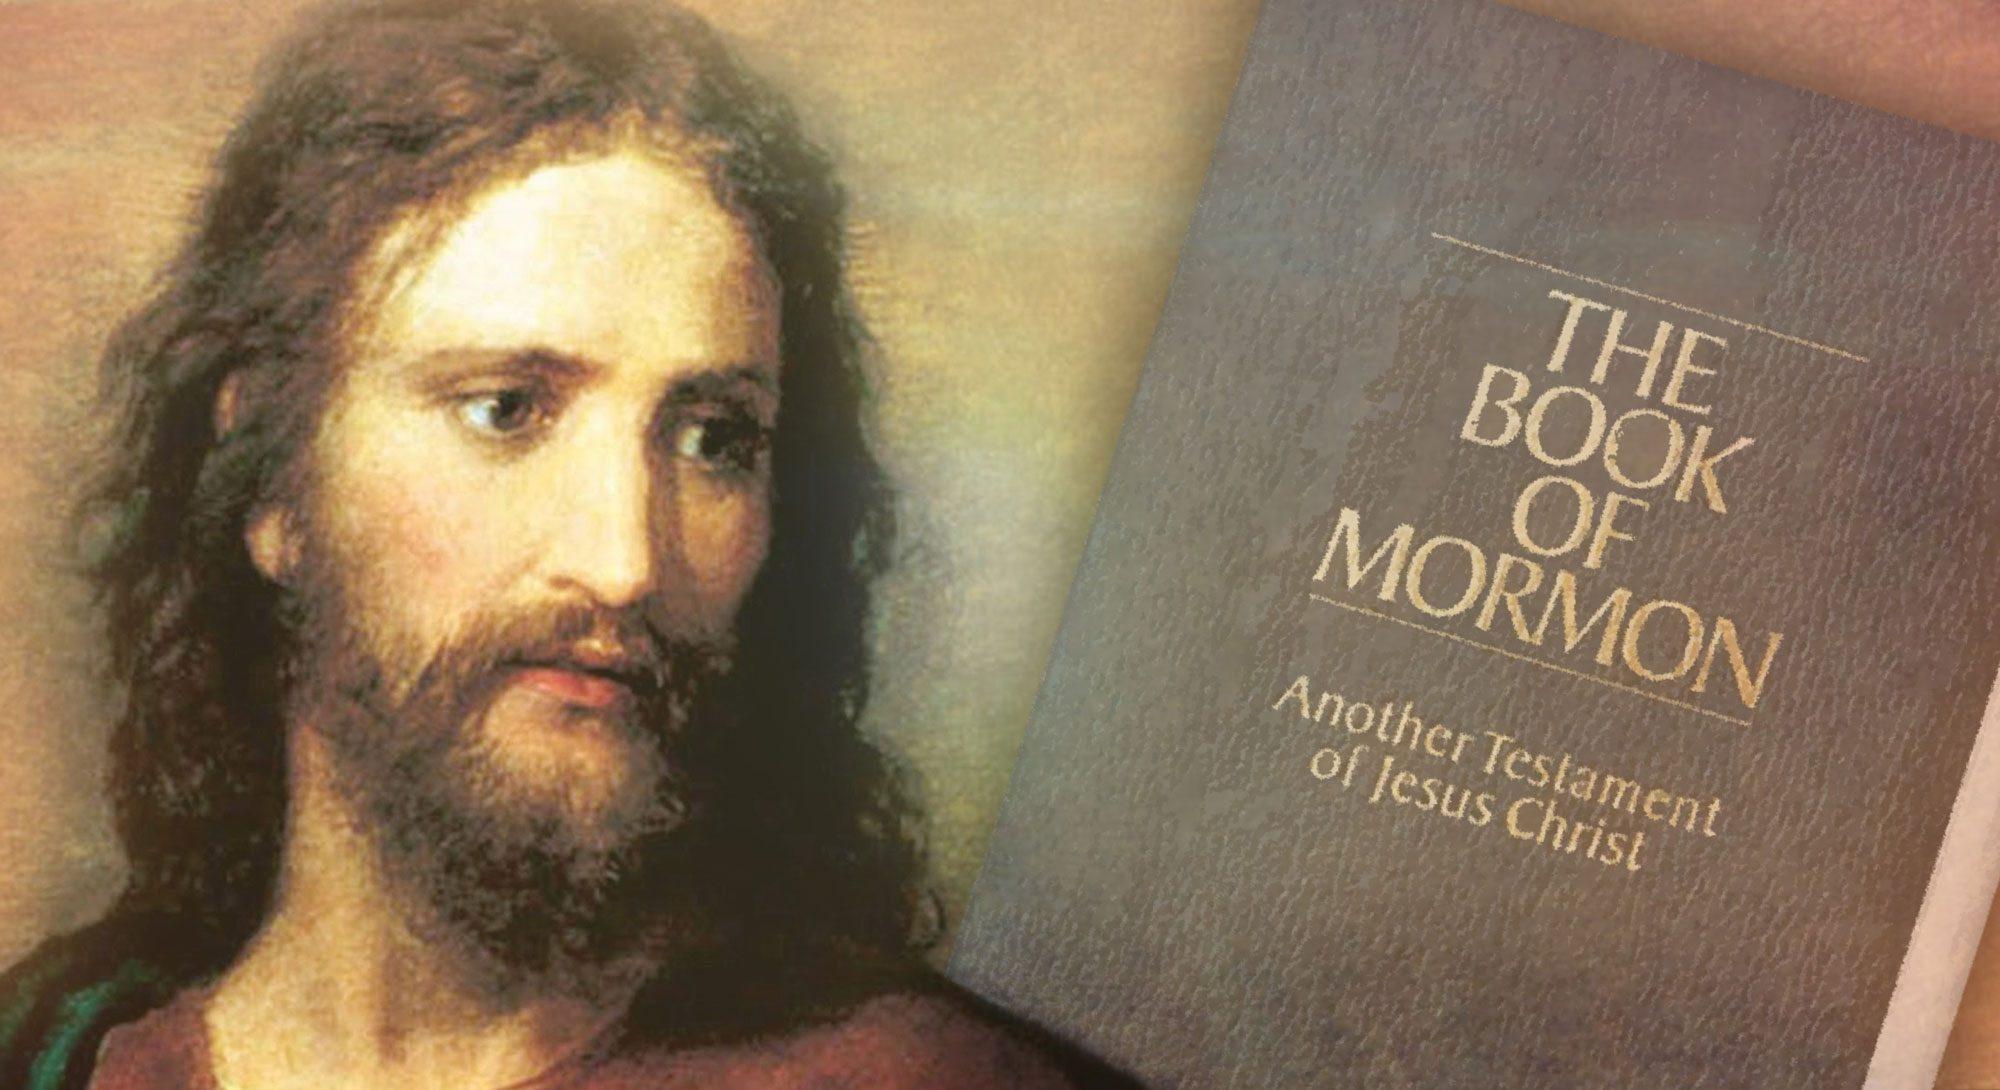 christ-book